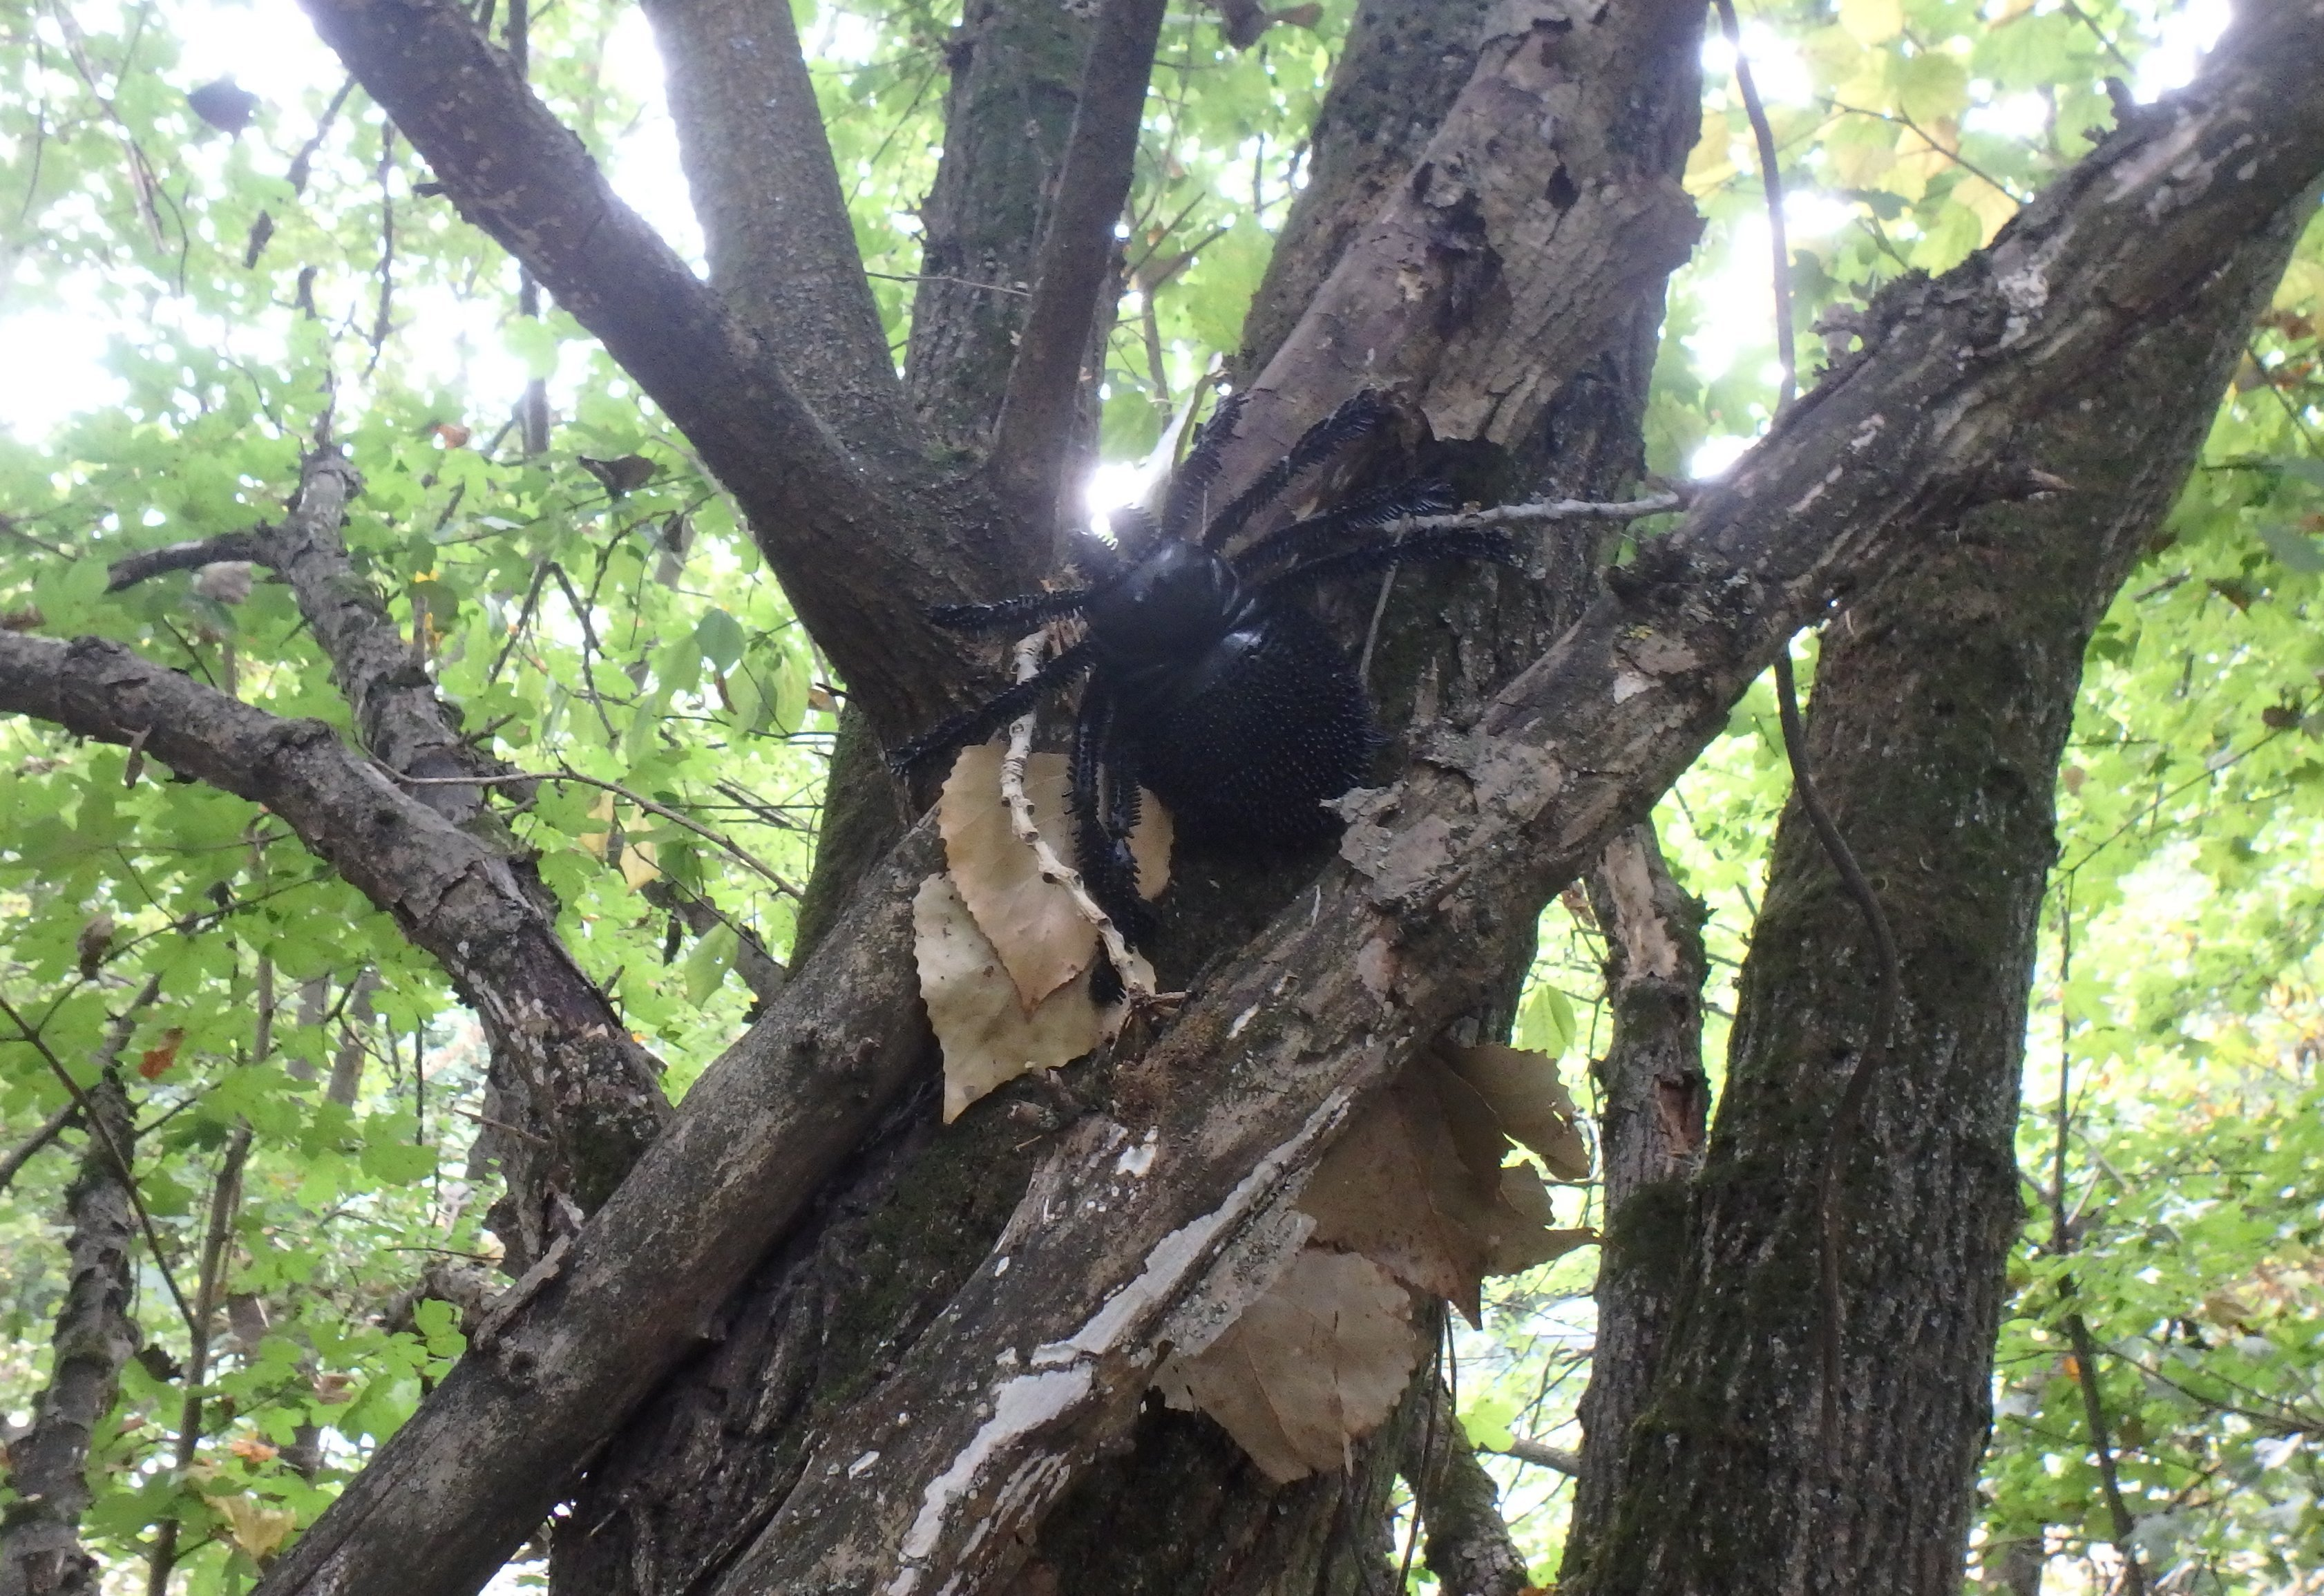 Spider geocache up in the tree - itstartswithacoffee.com #spider #geocache #geocaching #geocachingHungary #geocachinghide #ihideit #petling